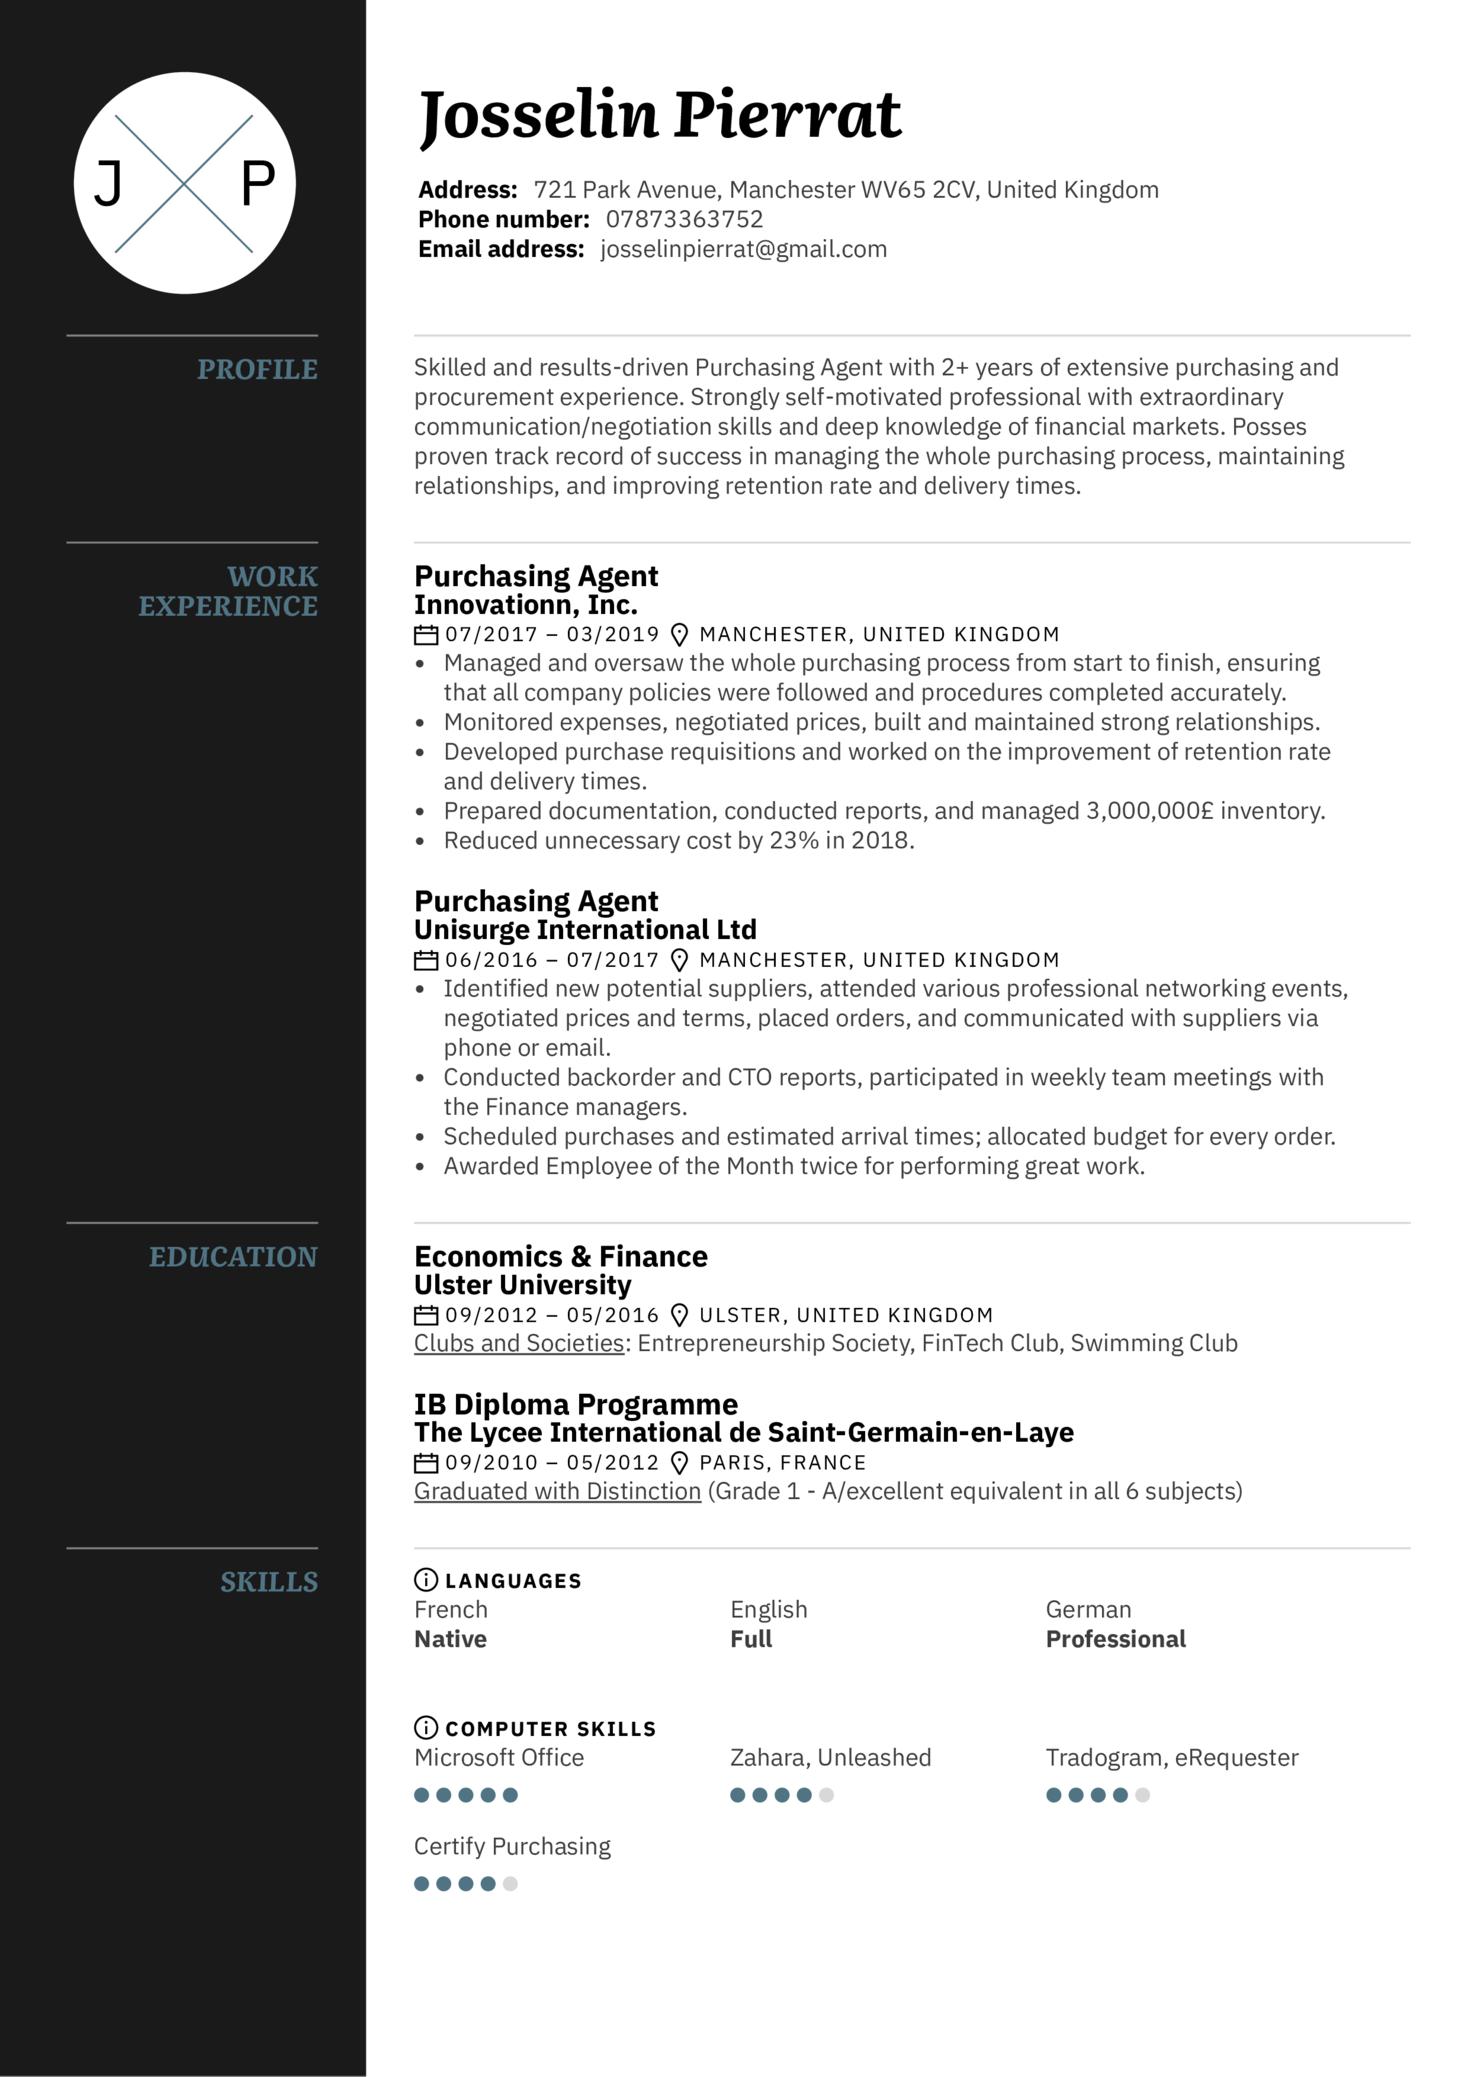 Purchasing Agent Resume Sample (Part 1)